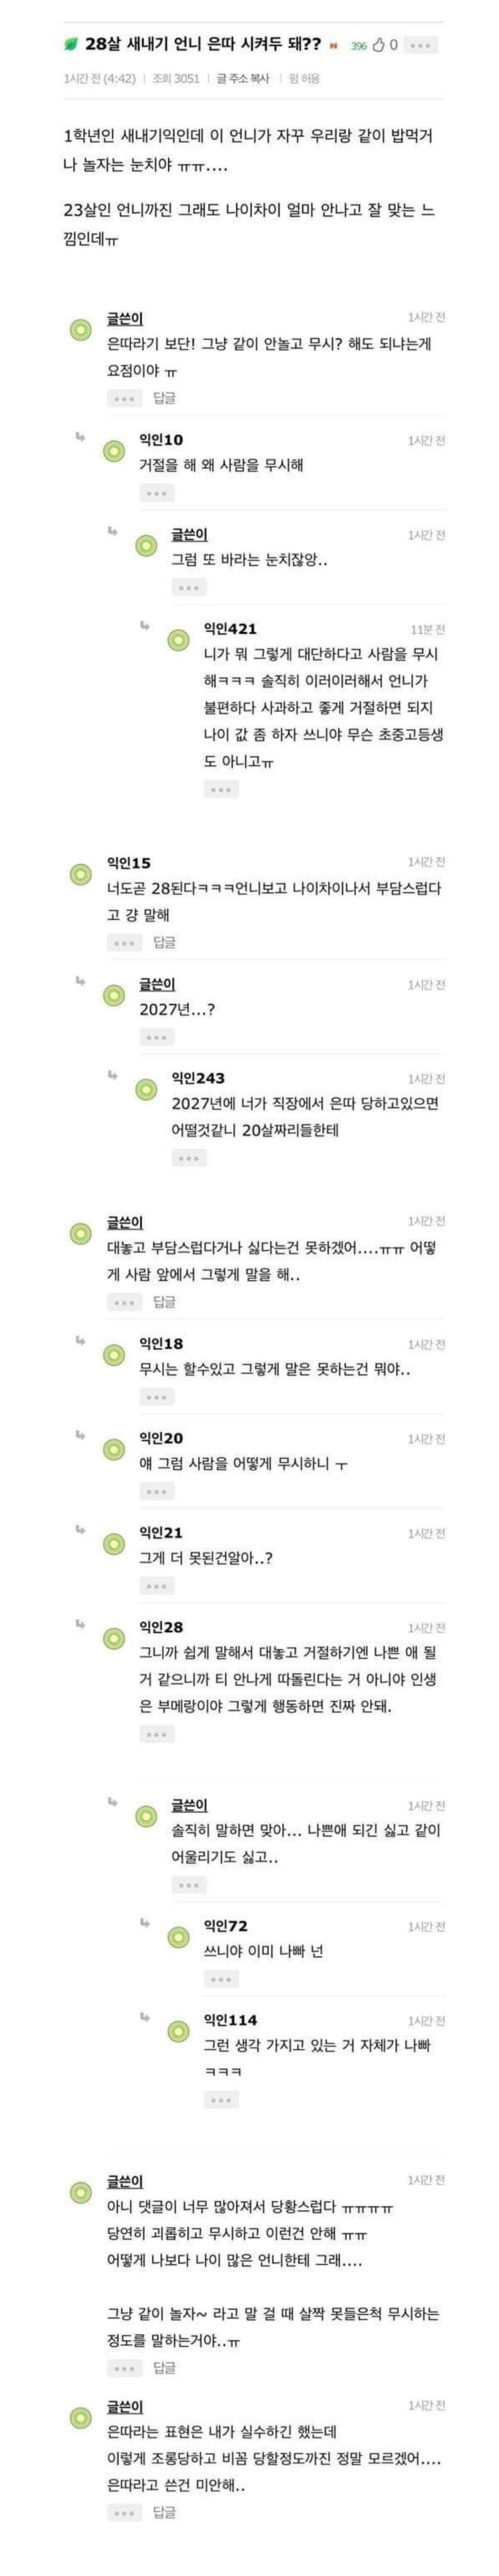 1.jpeg 28살 새내기 언니 은따시켜도돼?.jpg